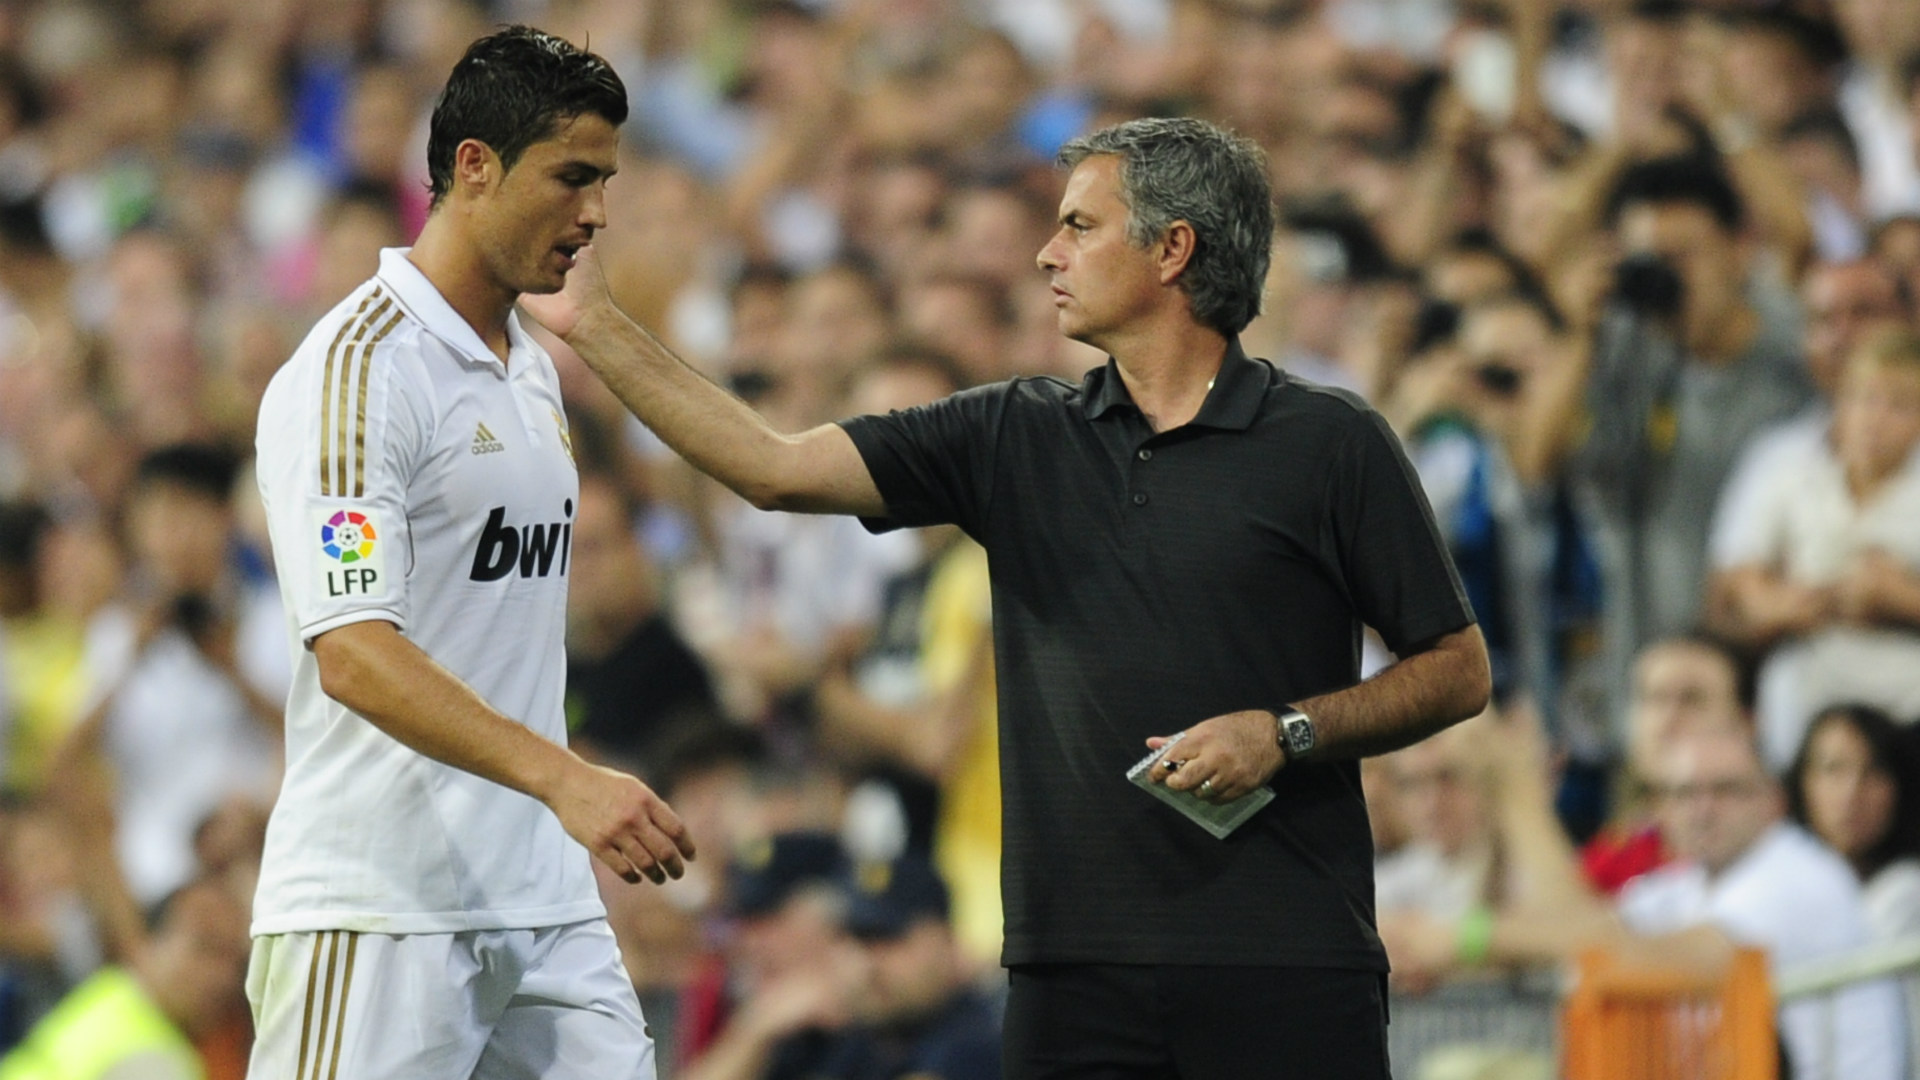 Perez mum on rumors Ronaldo wants to leave Madrid